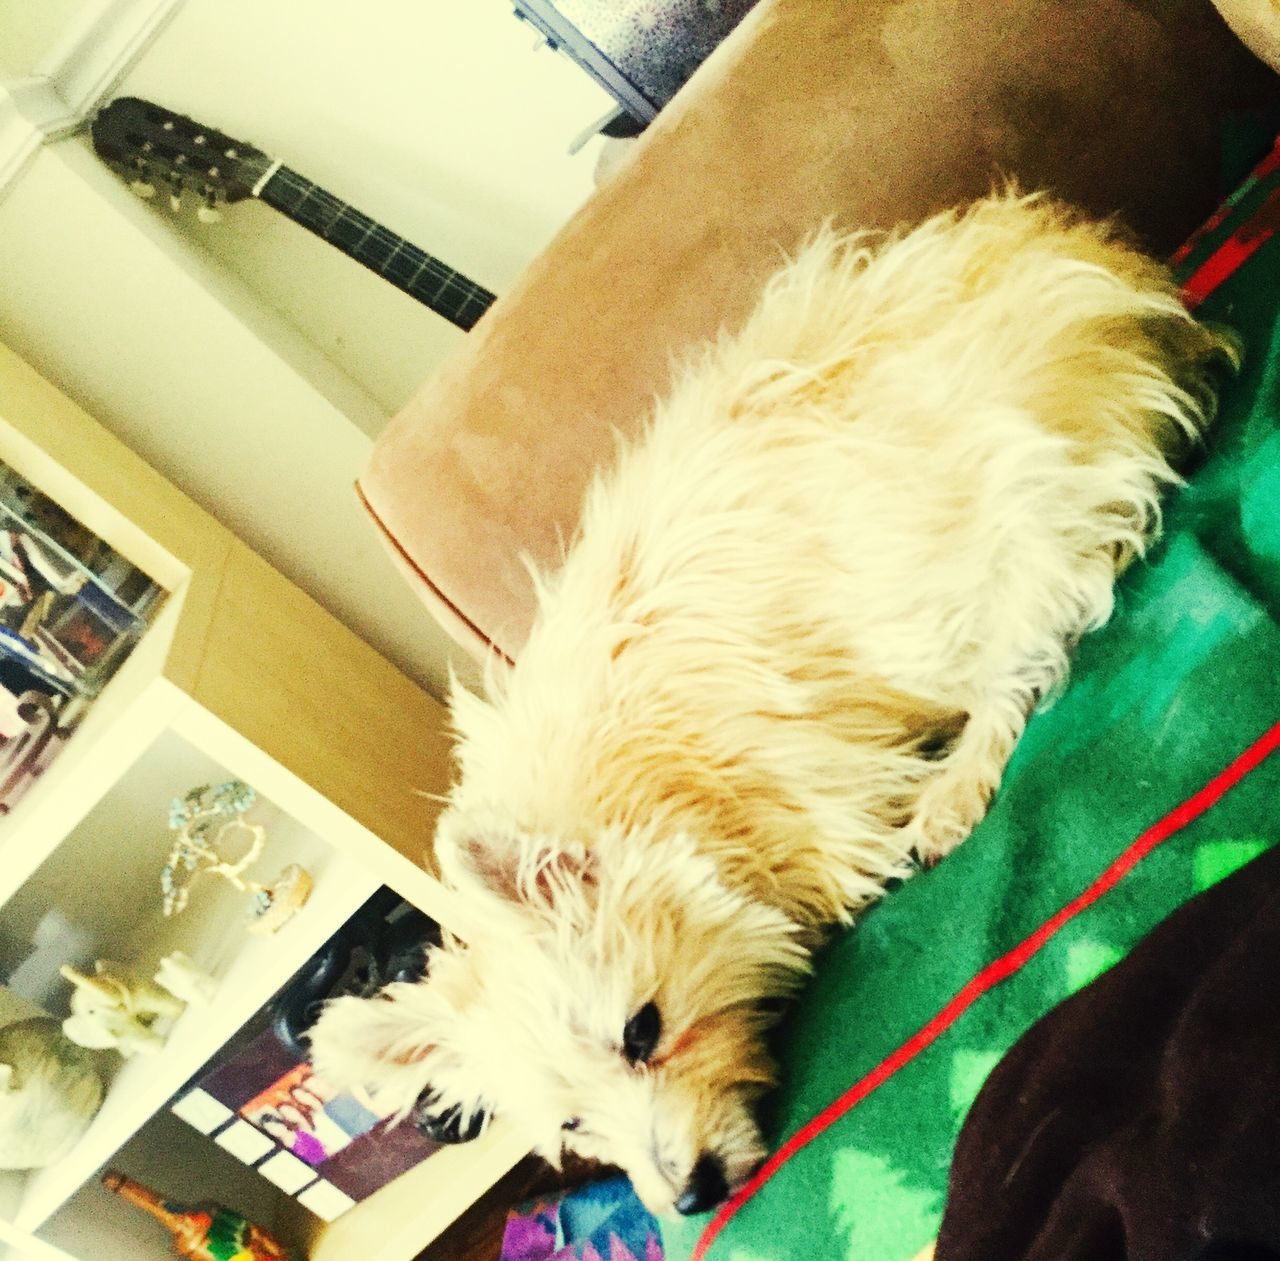 pets, domestic animals, mammal, dog, animal themes, one animal, indoors, sleeping, home interior, no people, close-up, day